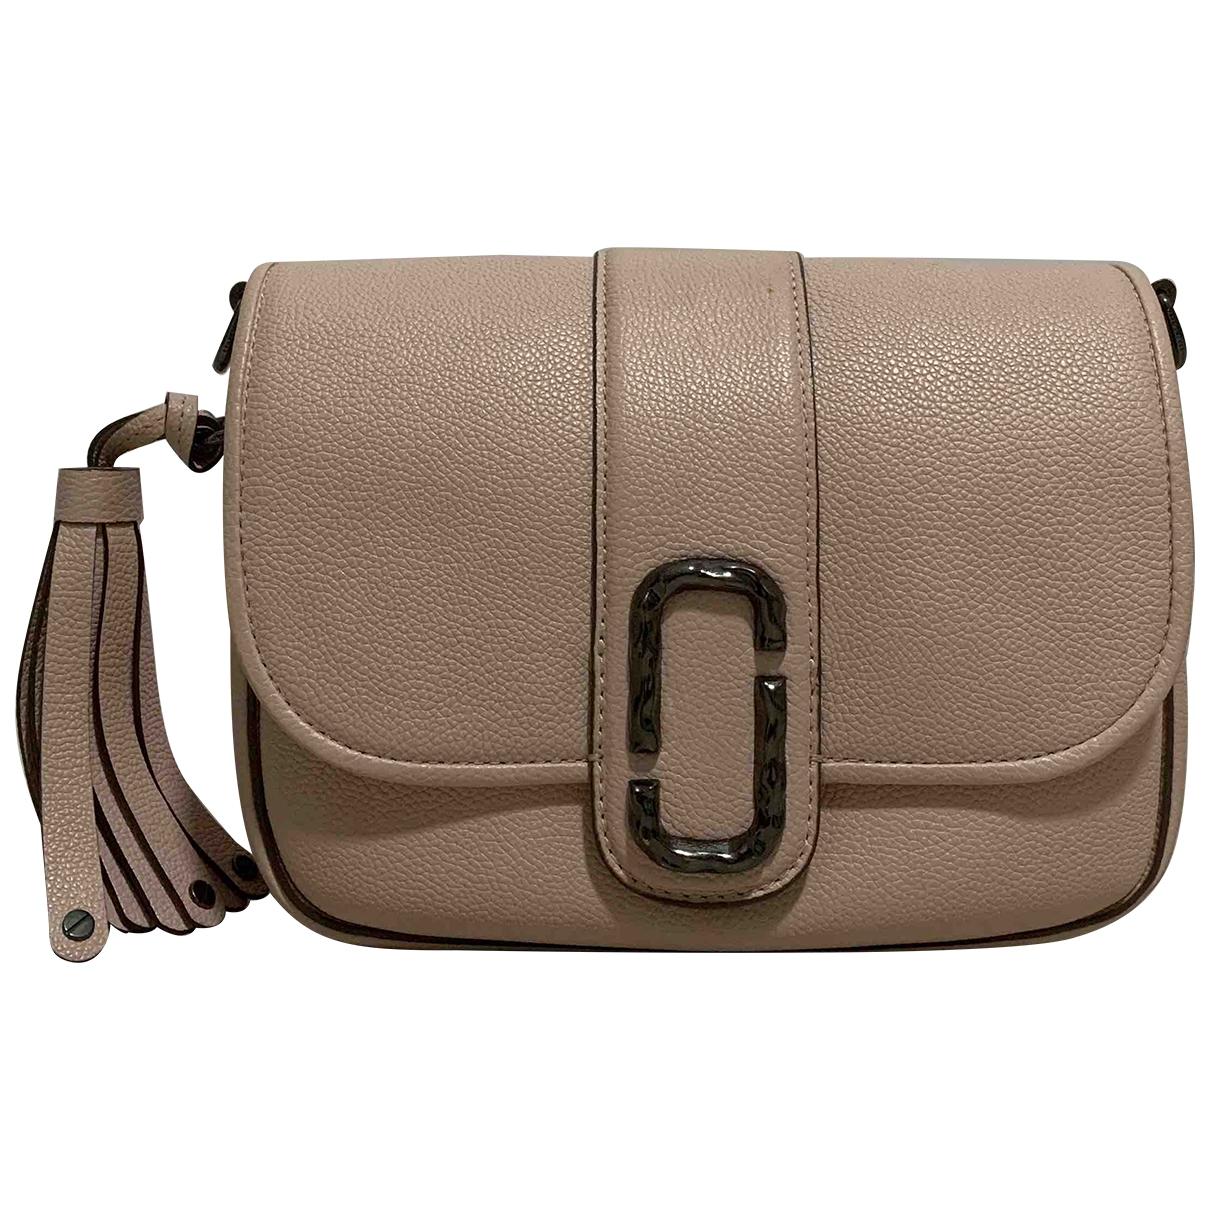 Marc Jacobs \N Pink Leather handbag for Women \N